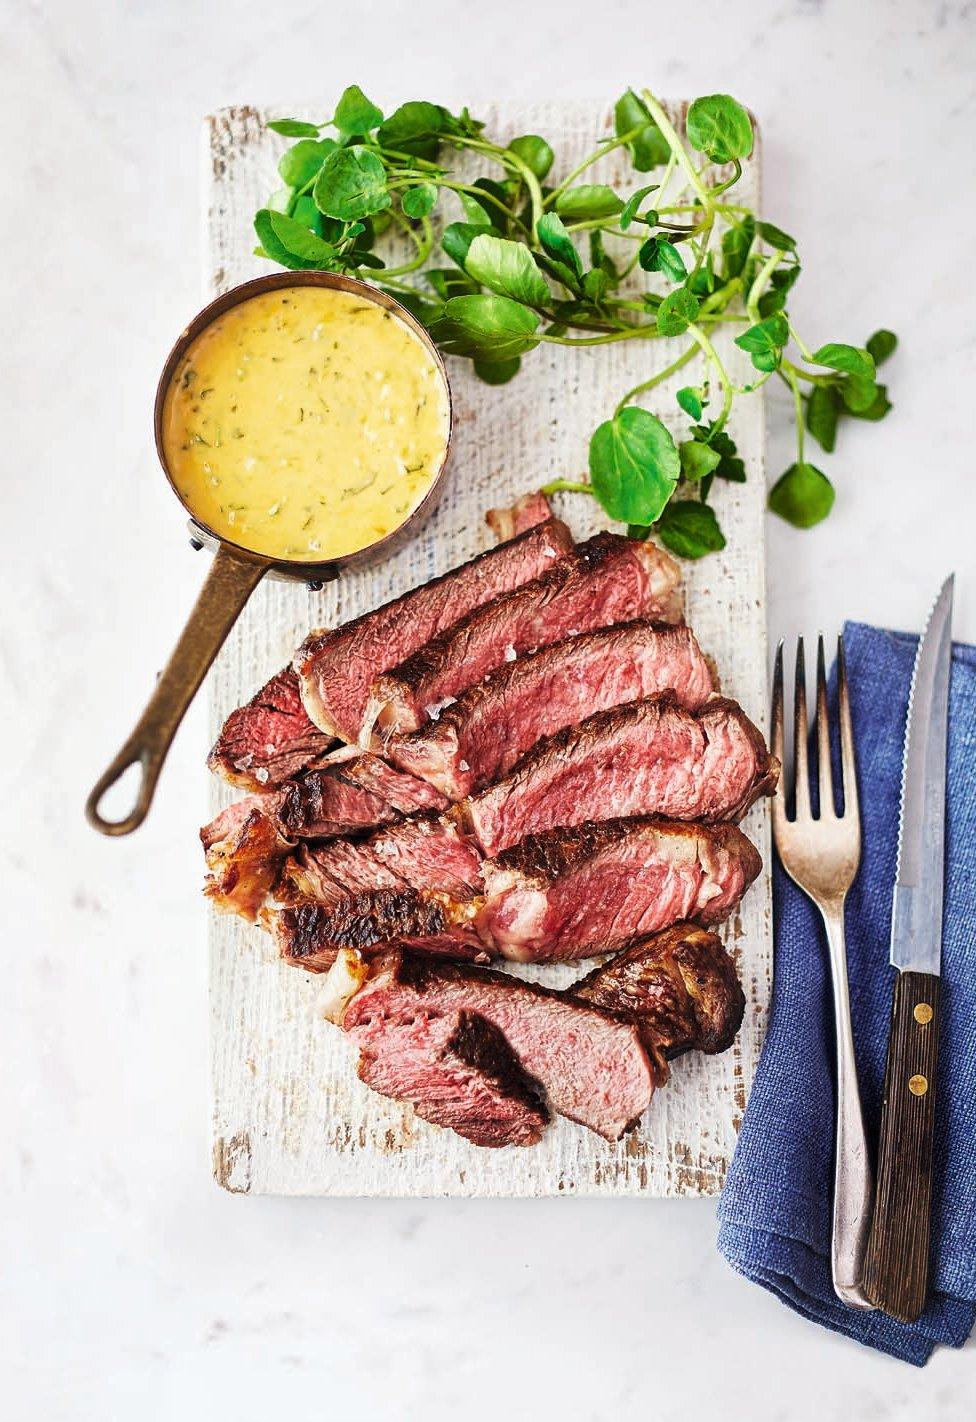 Boneless rib-eye steak with béarnaise sauce - delicious ...